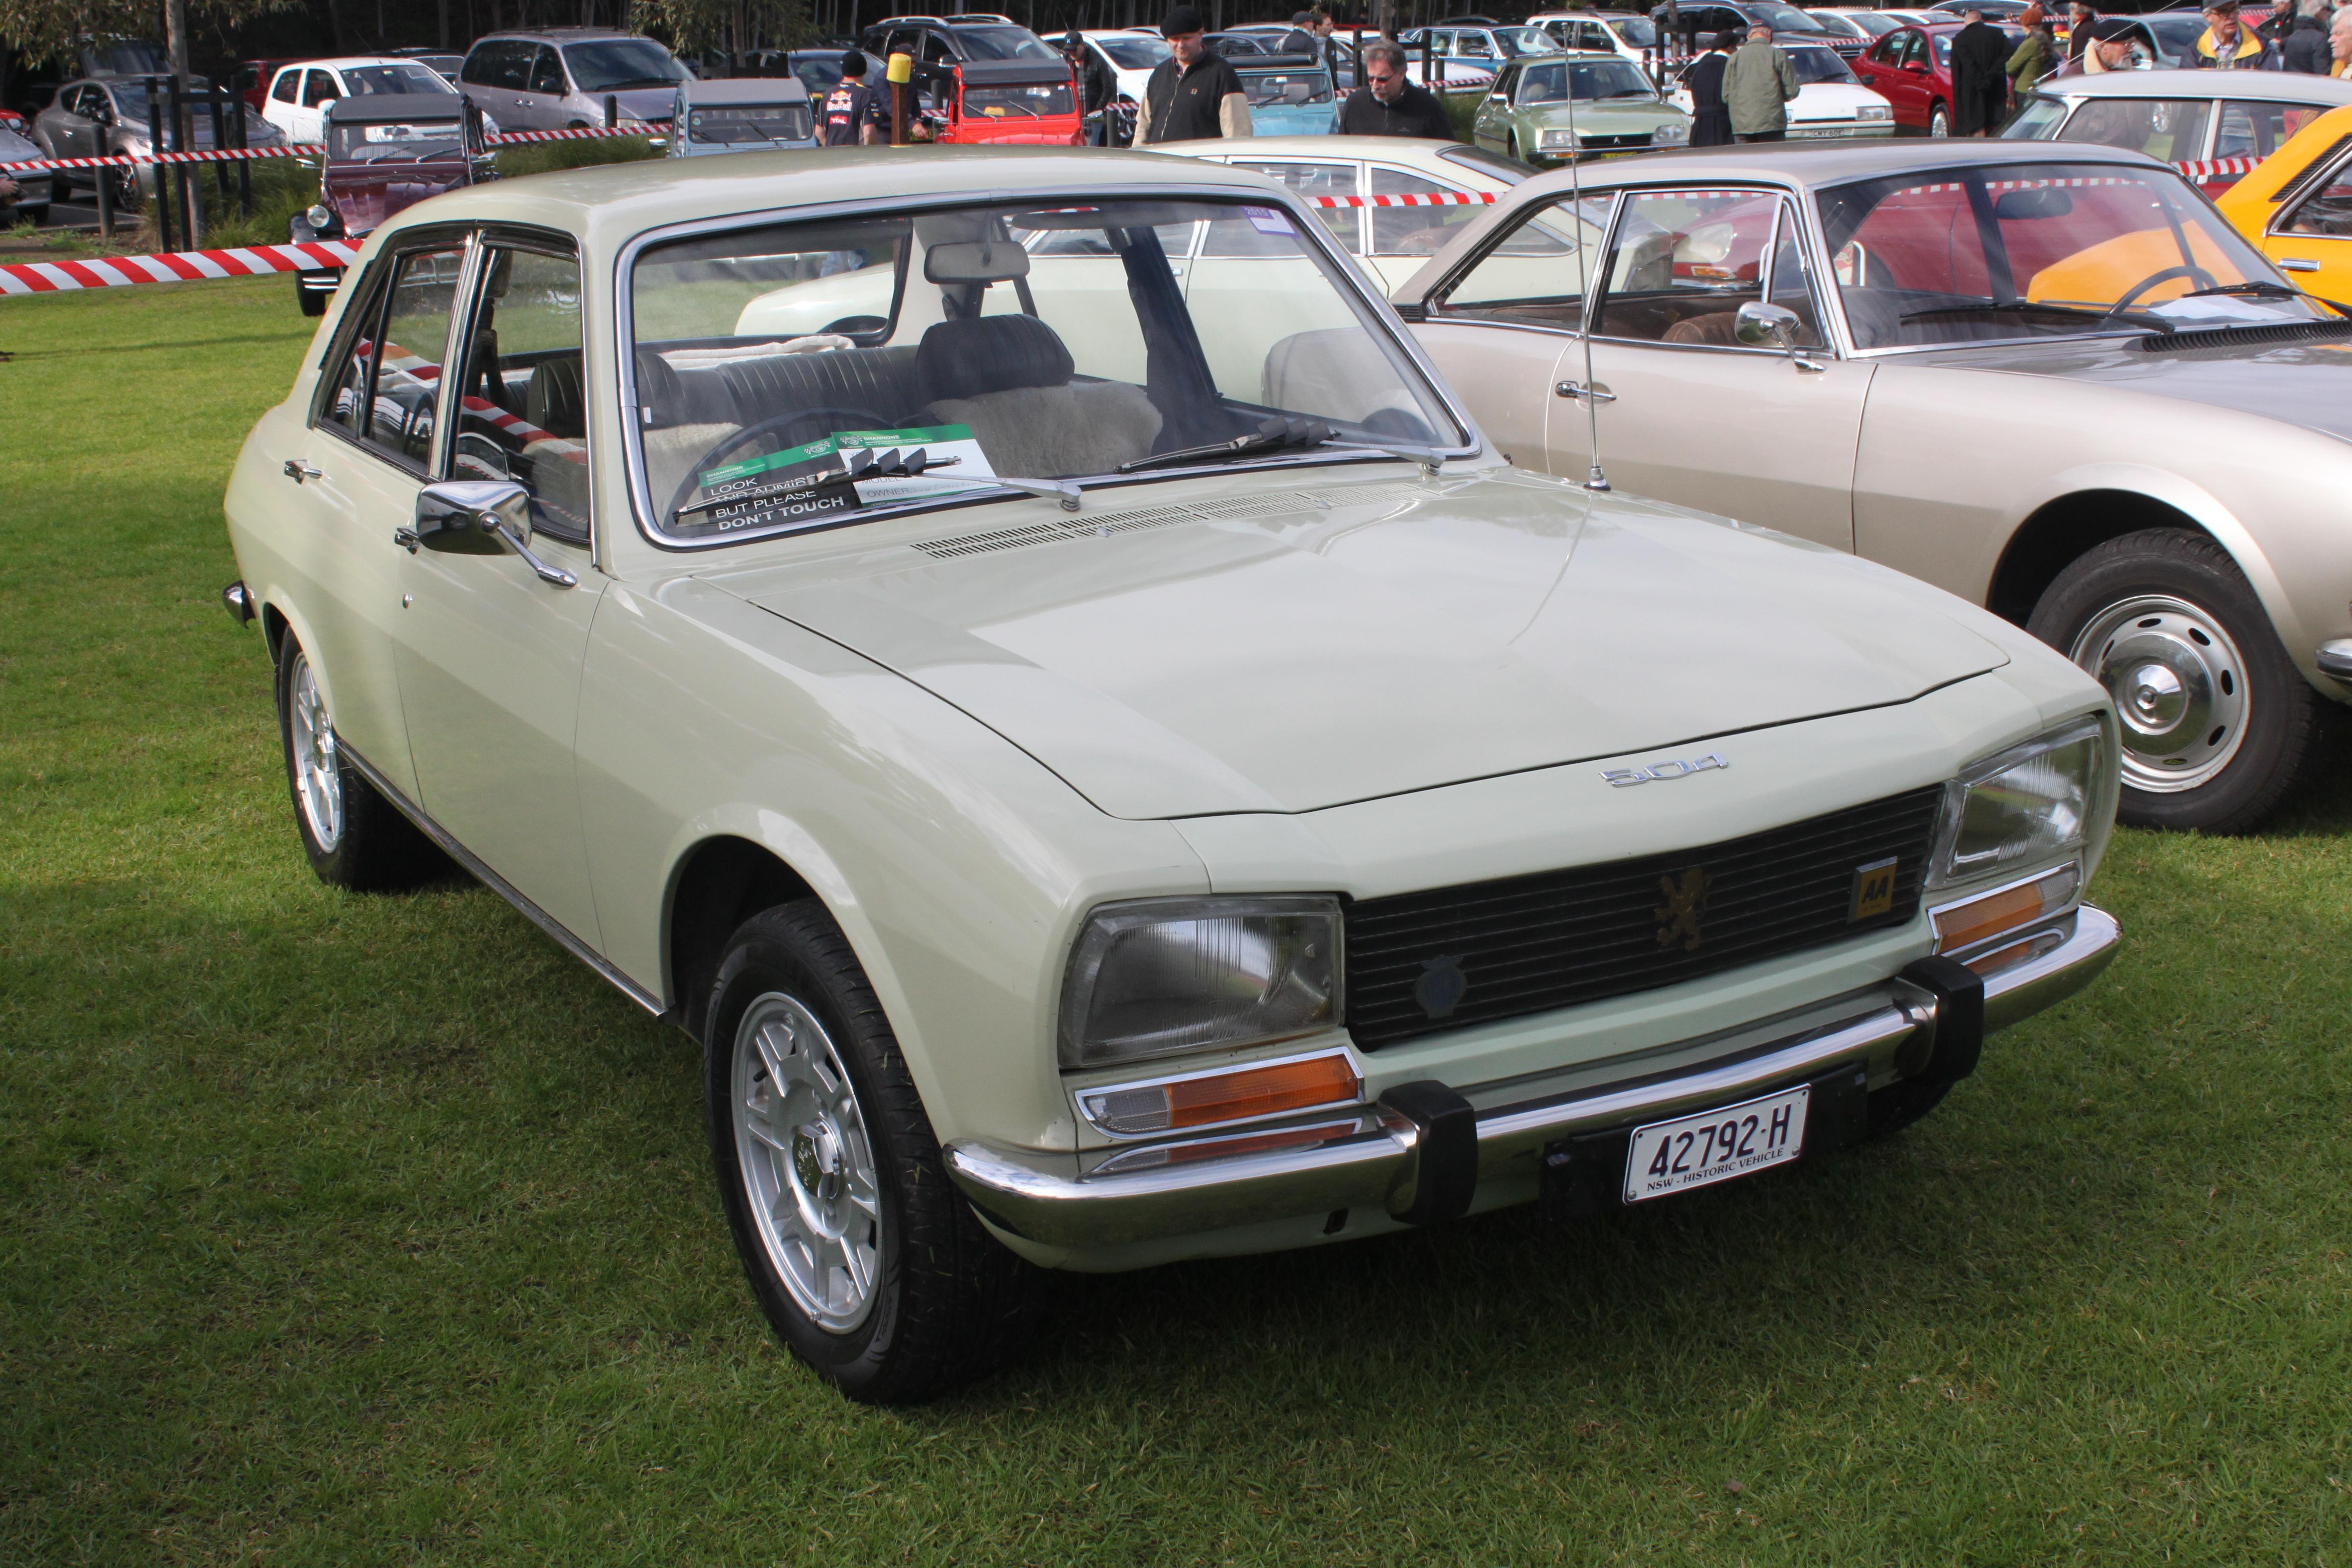 file:1972 peugeot 504 sedan (19556100898) - wikimedia commons